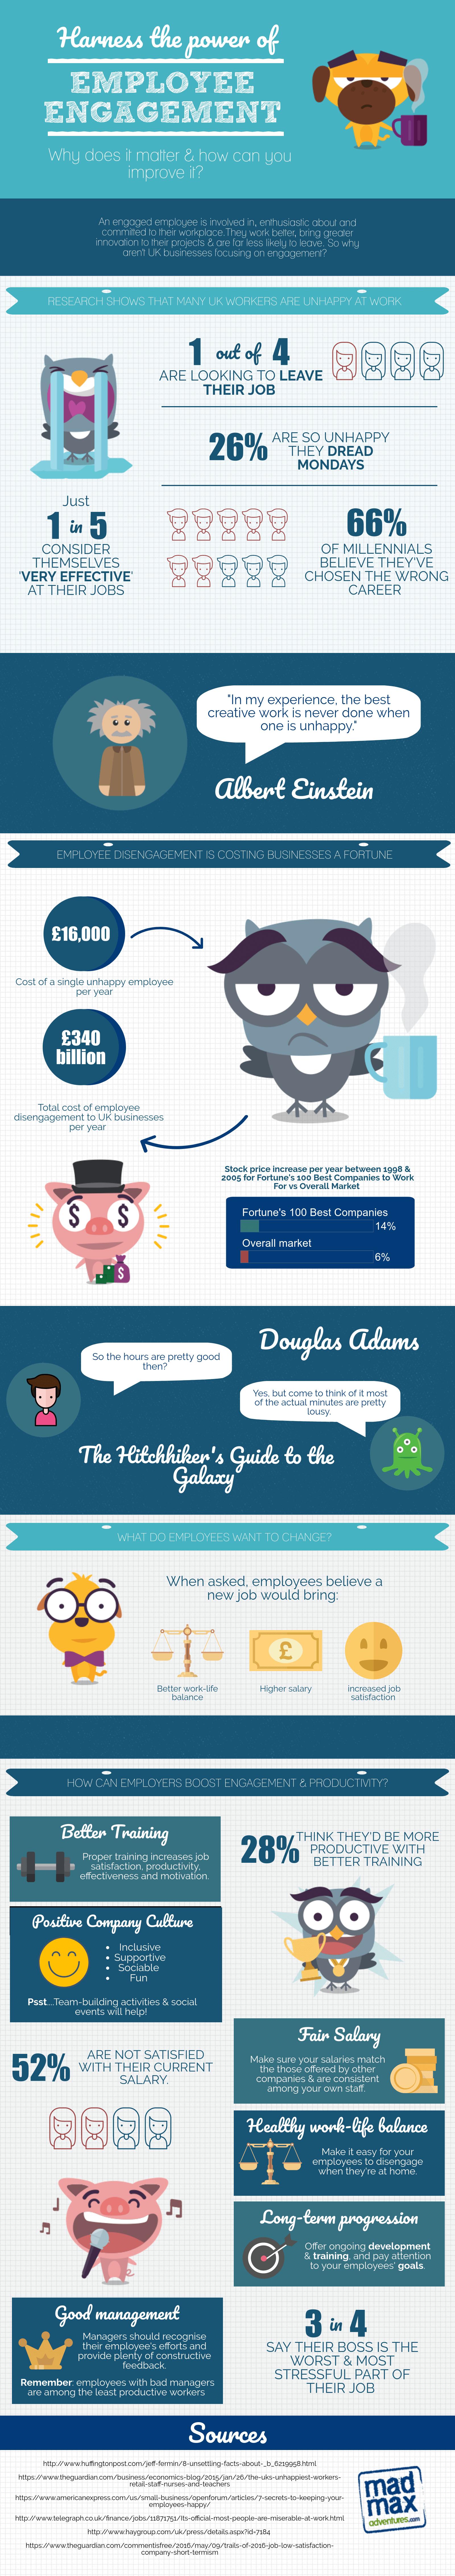 Improve Employee Engagement infographic